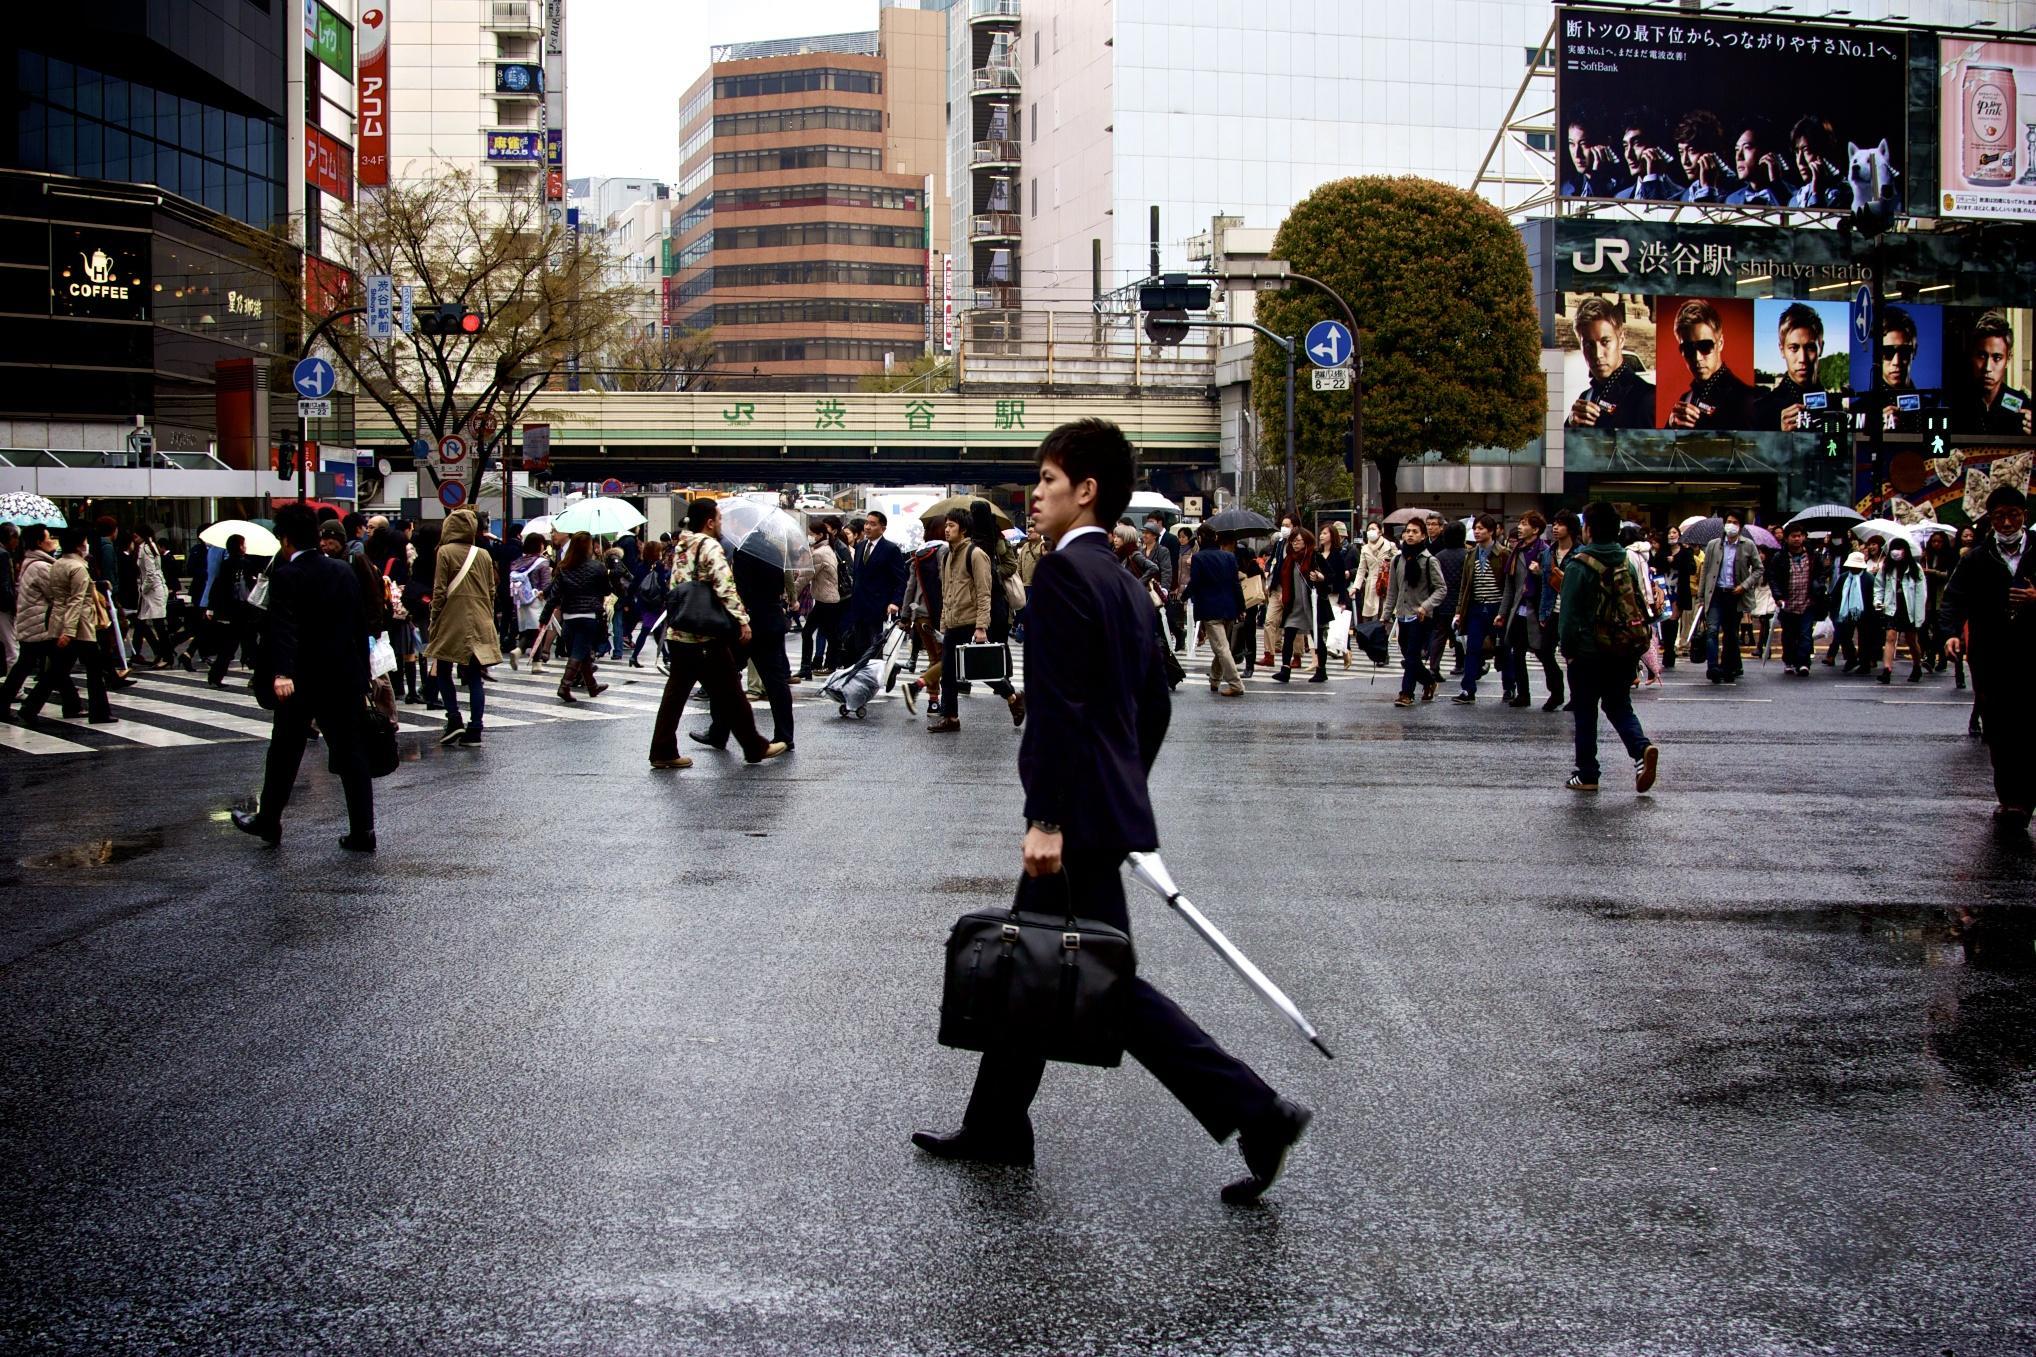 Dress codes in Japan